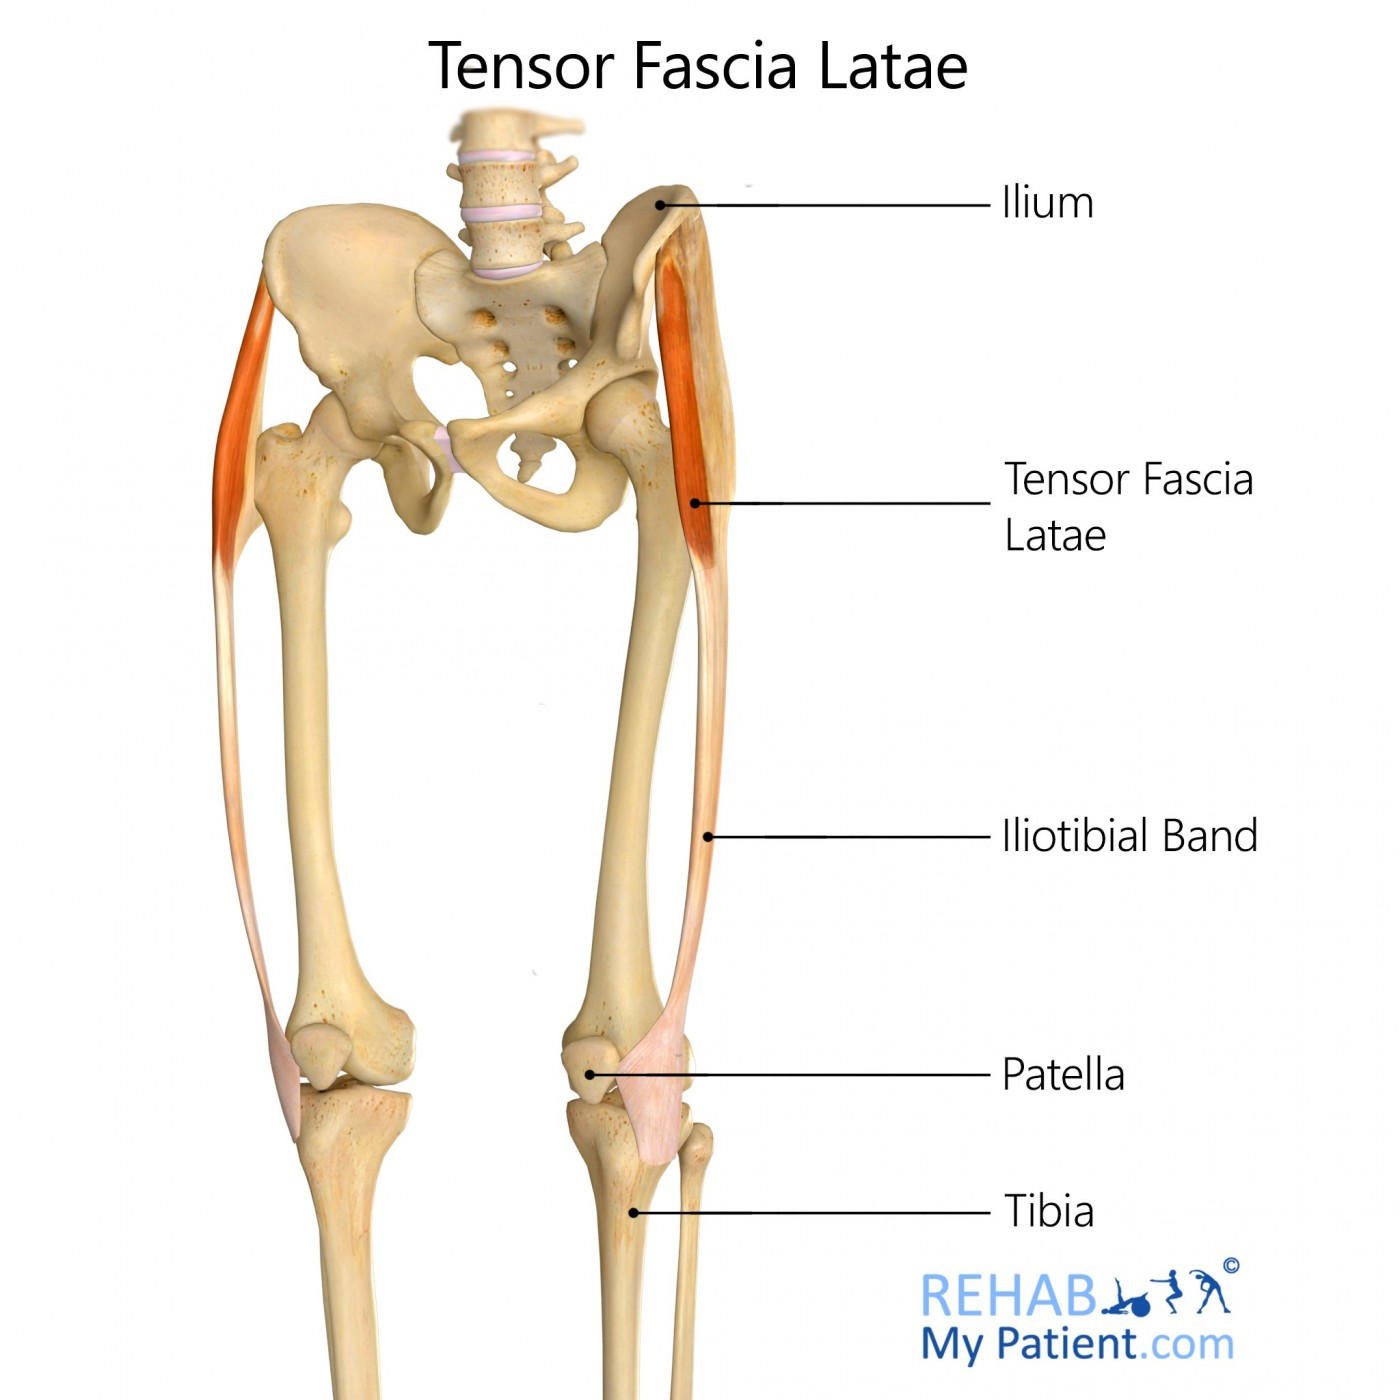 Tensor Fascia Latae